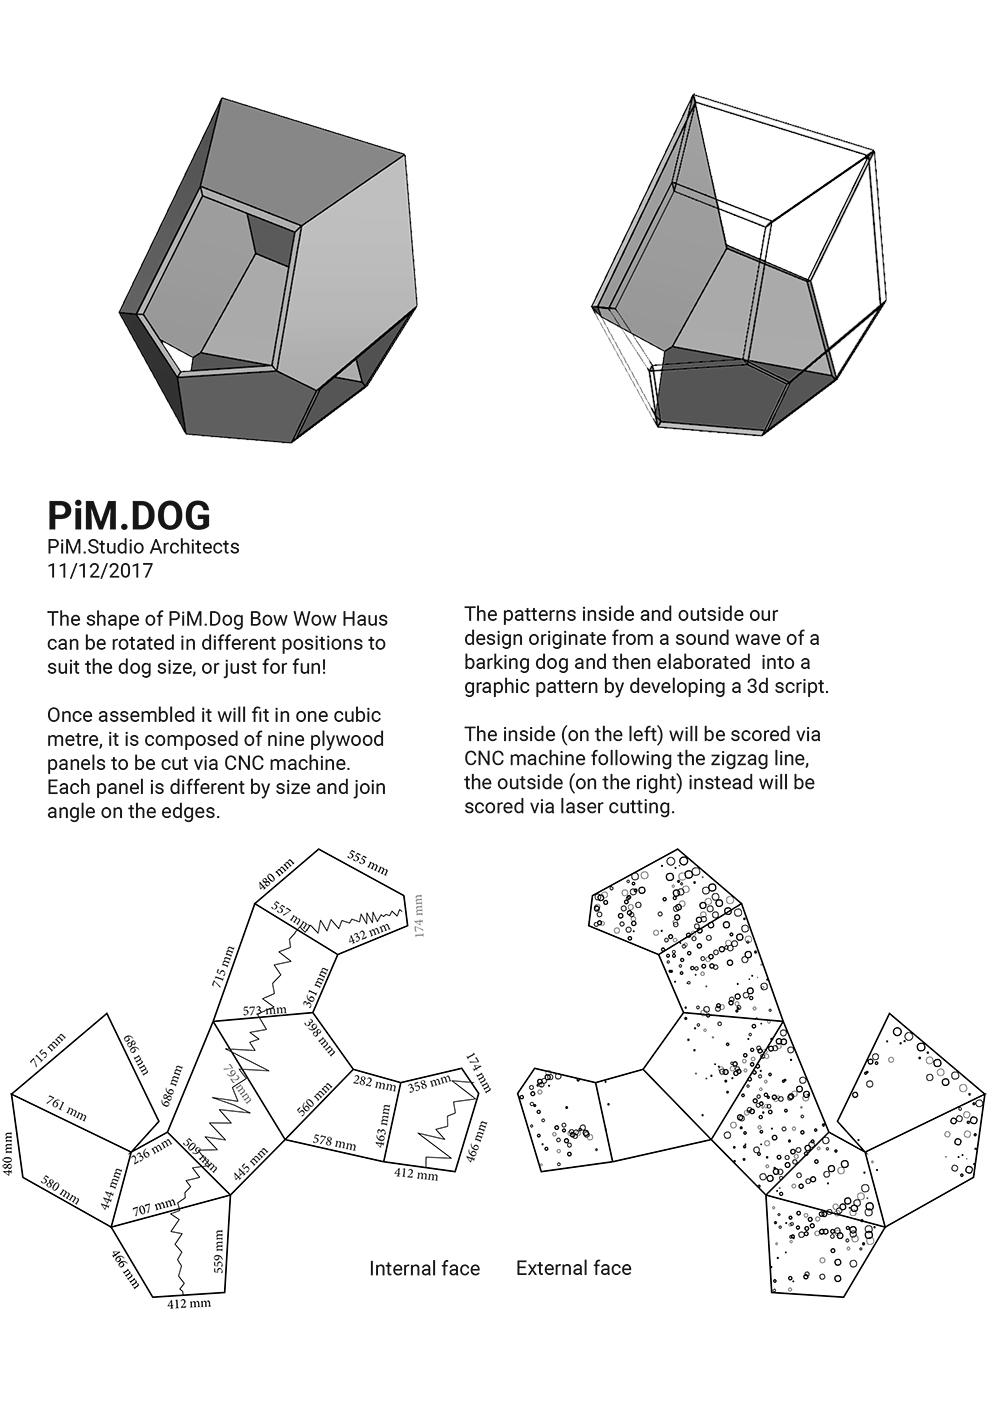 PiM.dog